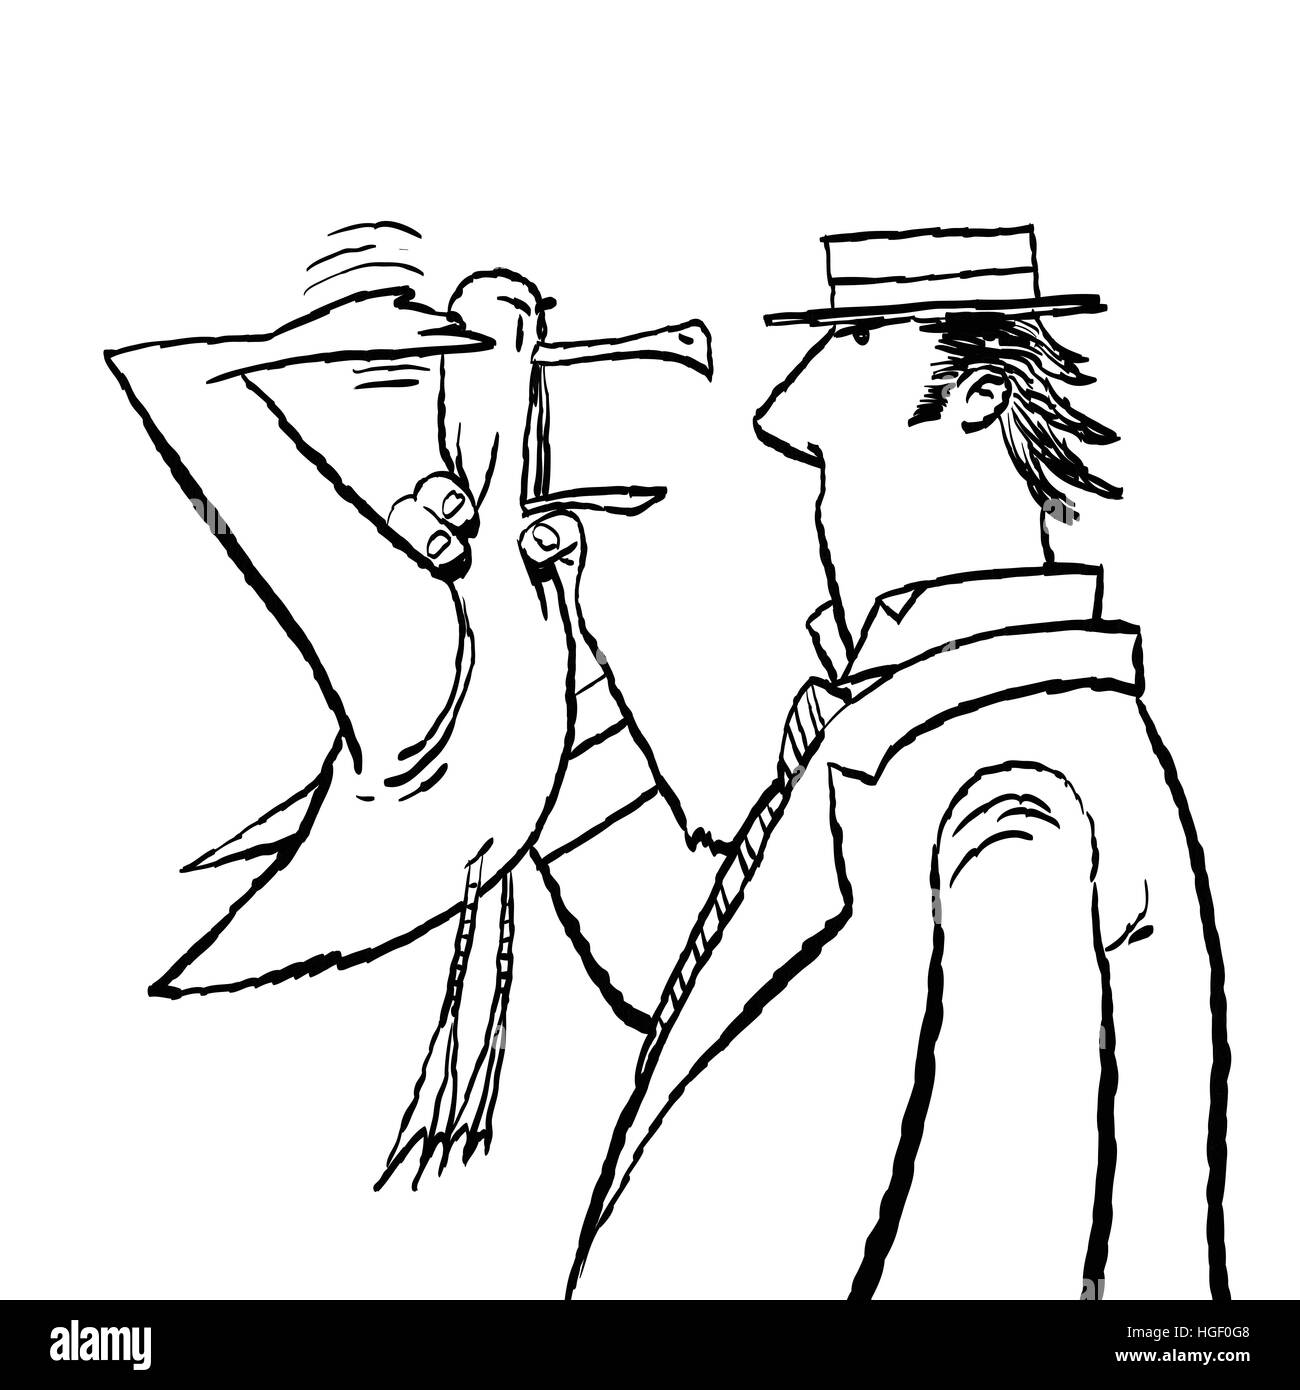 Gentleman and Seagull humor - Stock Vector